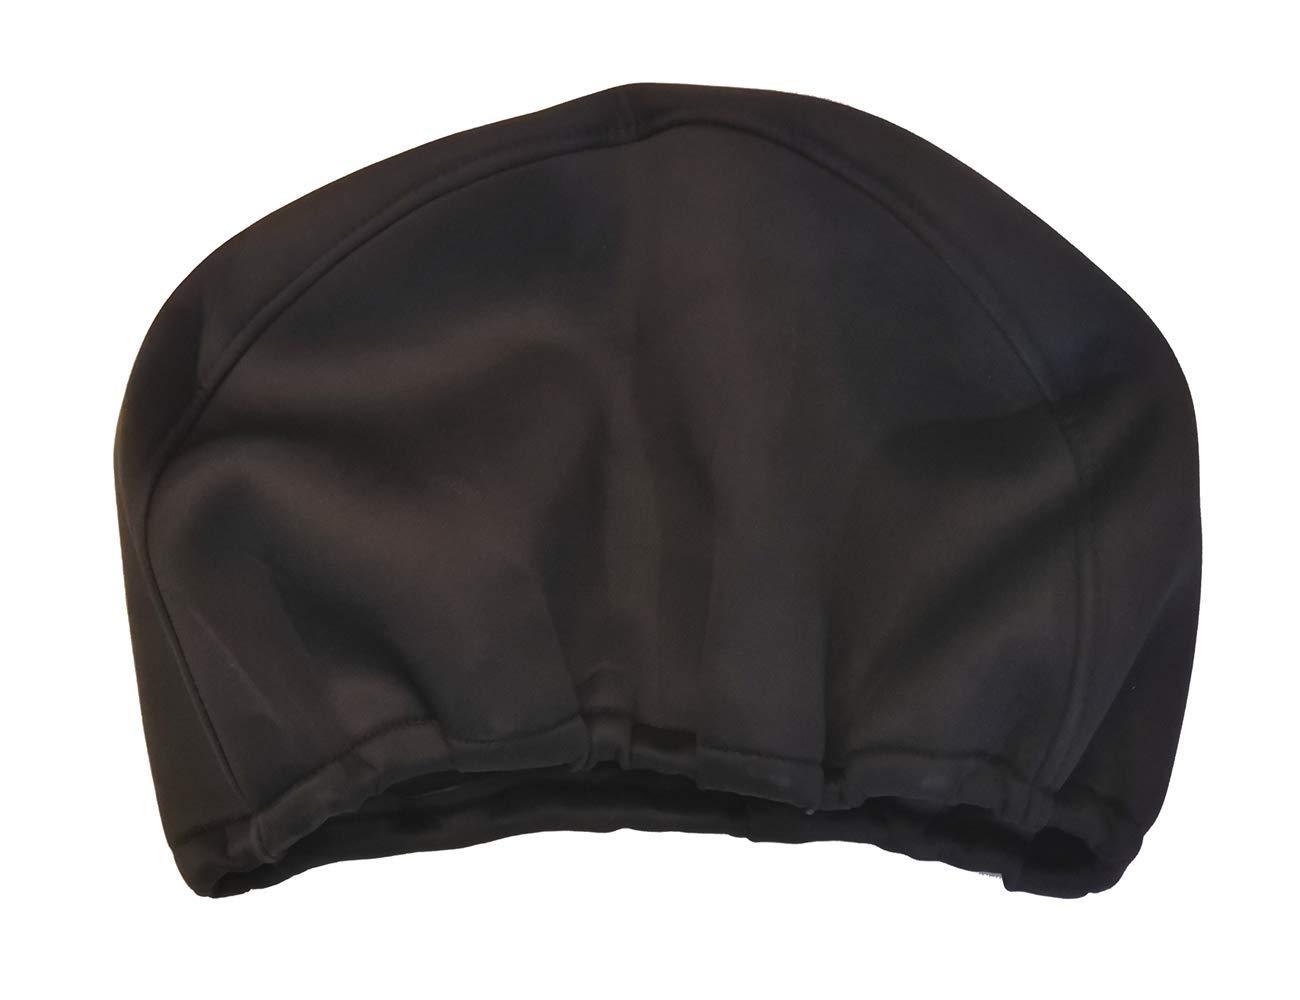 SINOKING Winch Cover Waterproof dust-Proof UV Resistant and Insulation Ideal/,Neoprene/,Black. UV Resistant and Insulation Ideal,Neoprene,Black